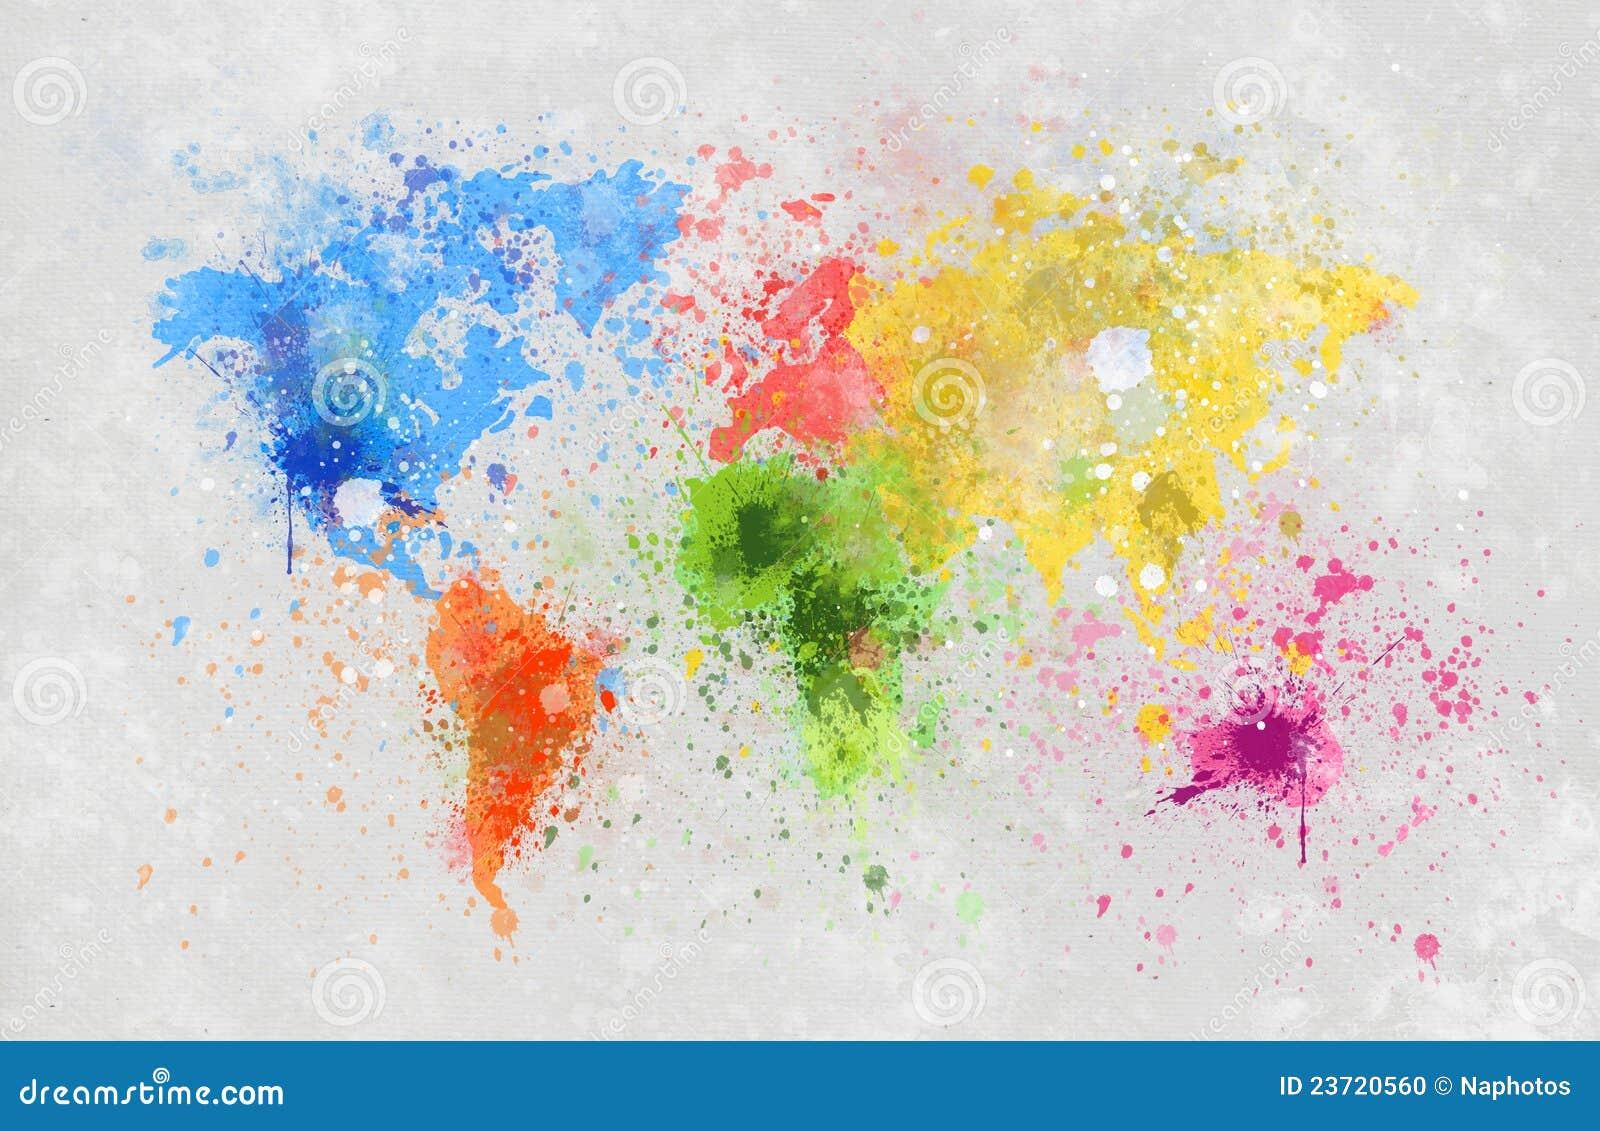 Map Of The World Painting – noketk